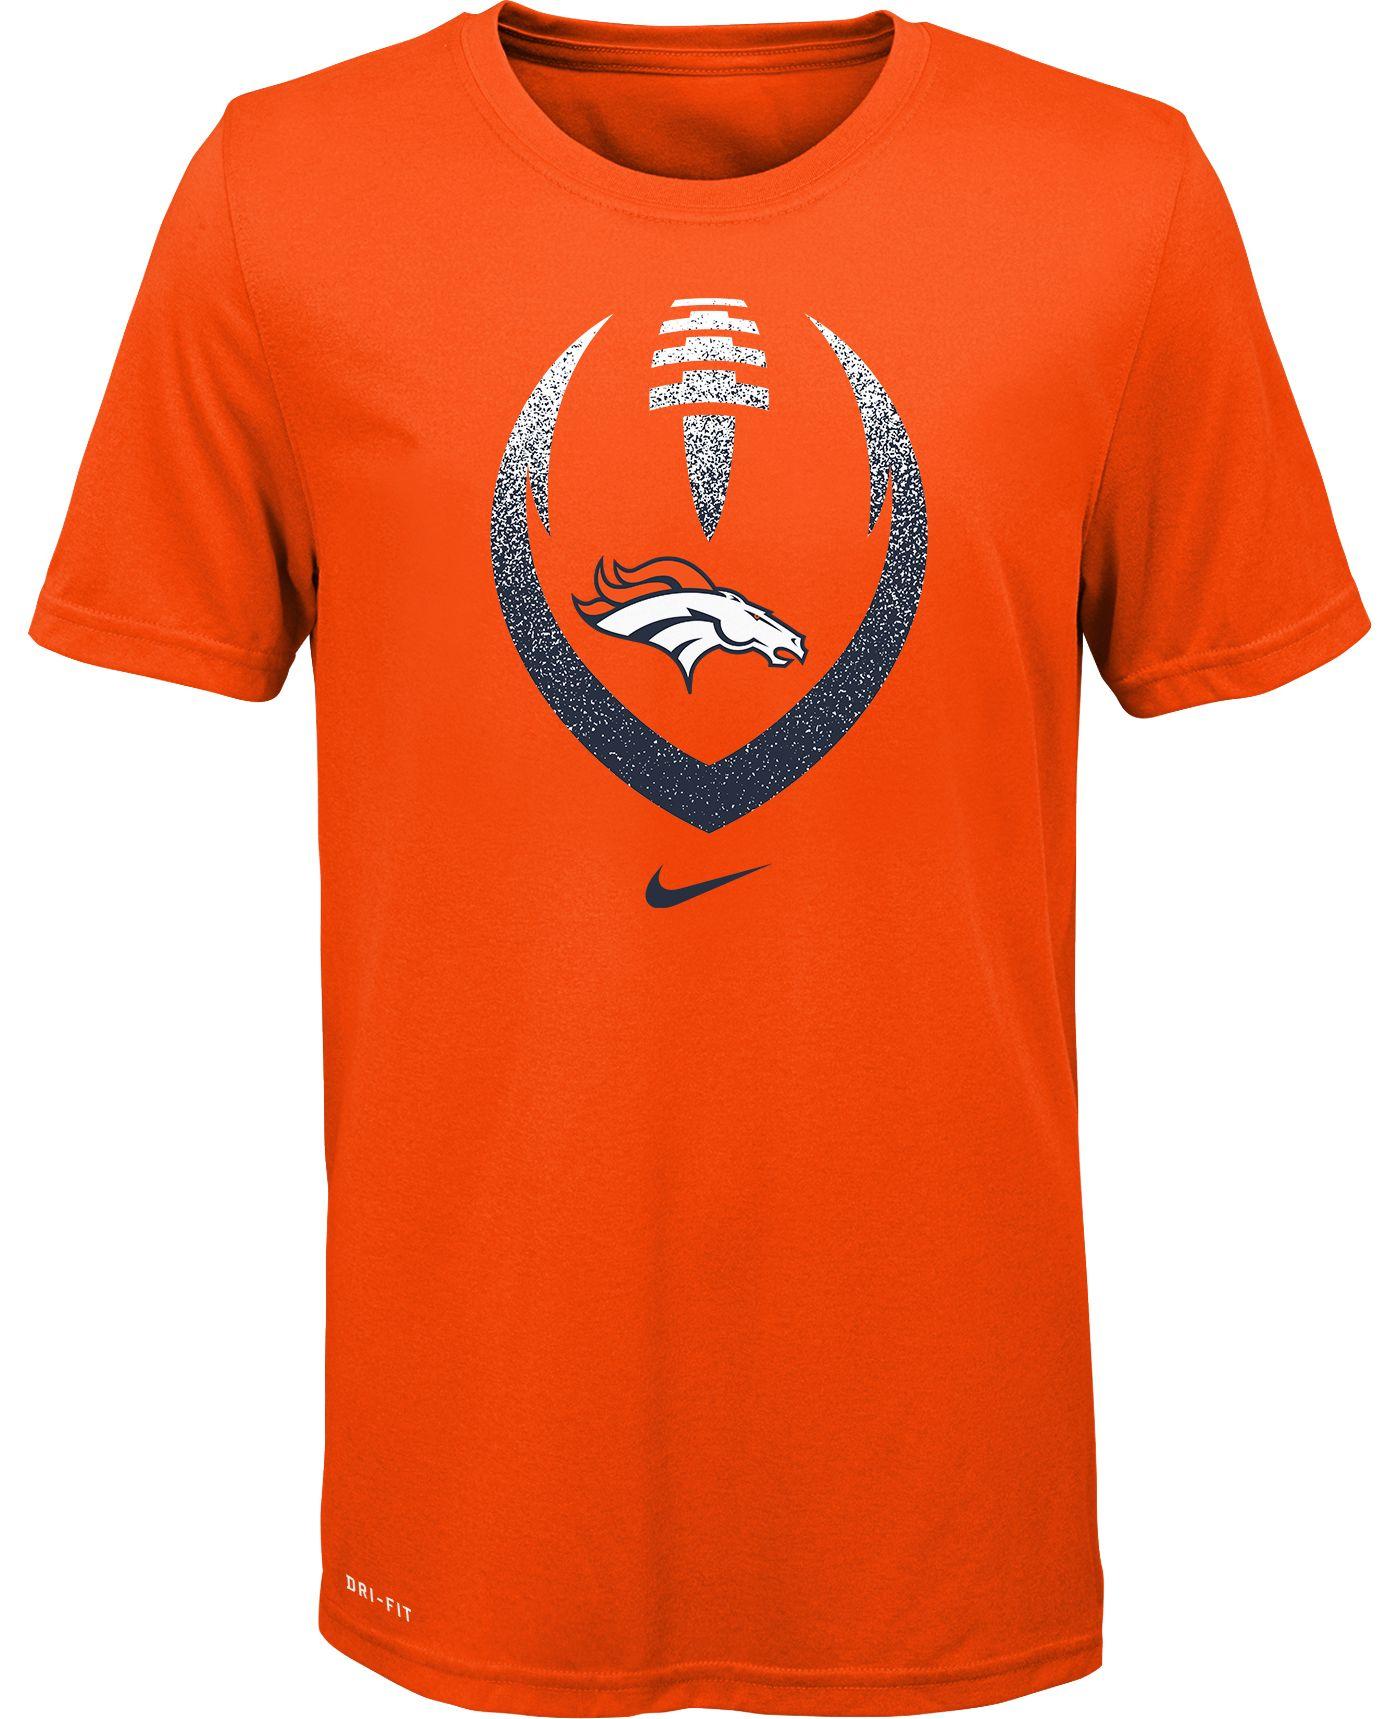 Nike Youth Denver Broncos Icon Performance Orange T-Shirt